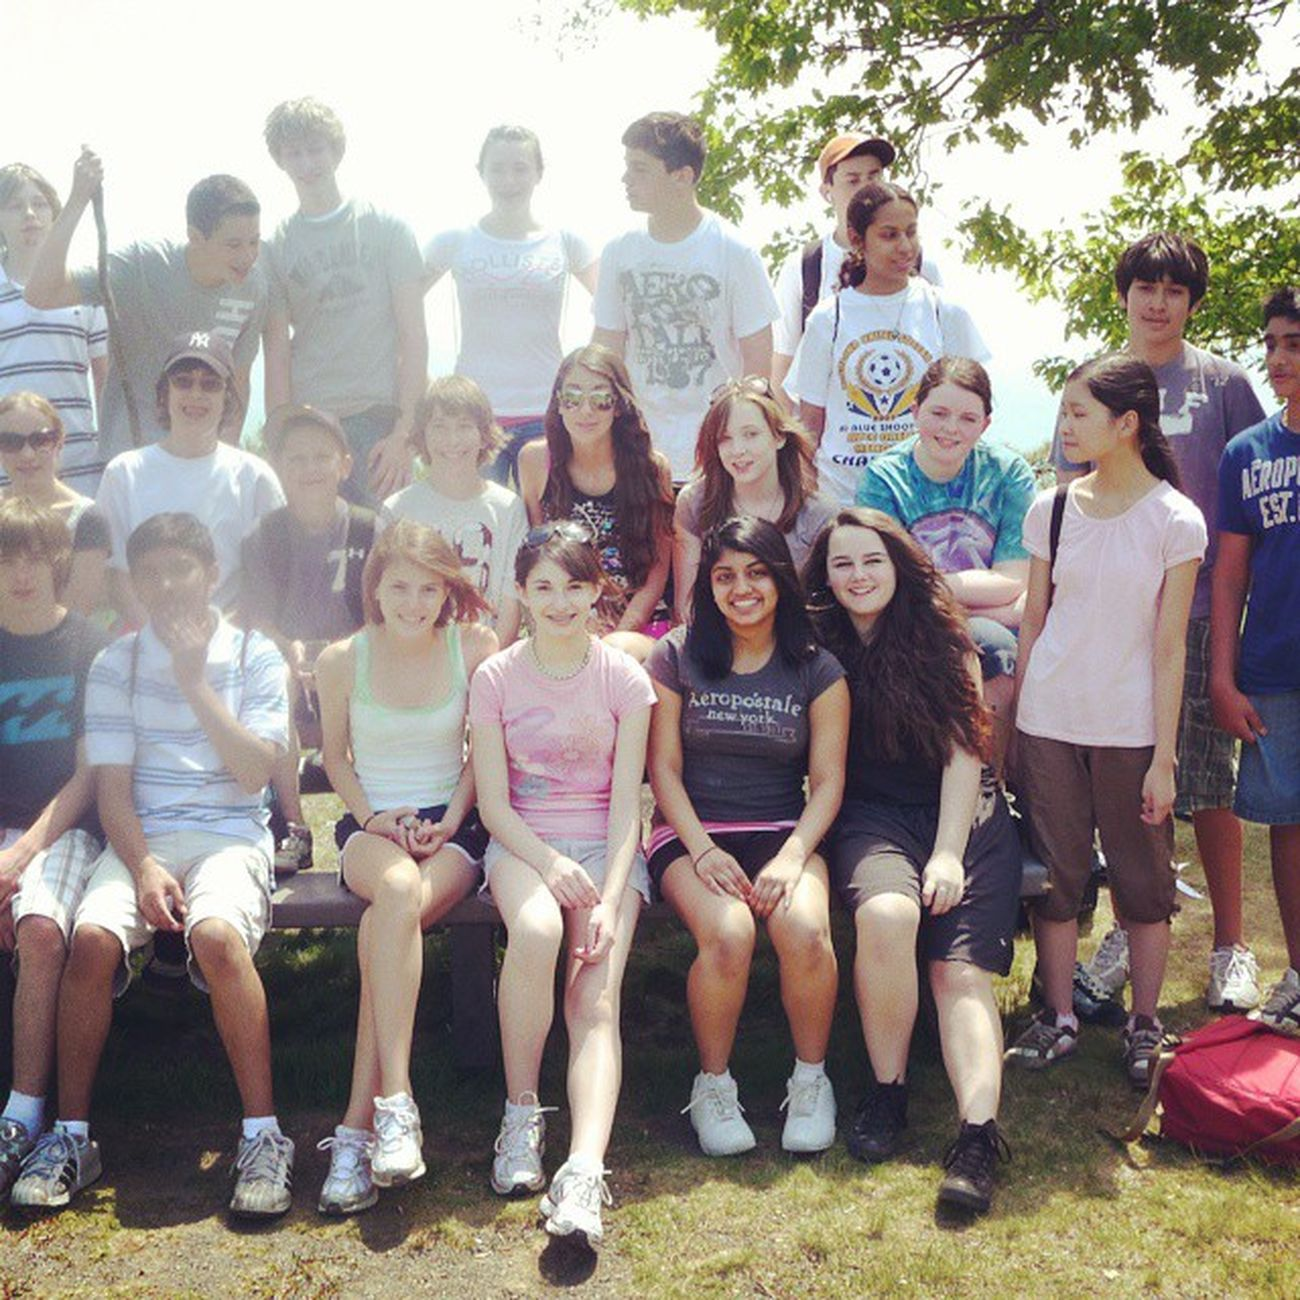 TBT  throwback to when Heffernan's eighth grade science class took a trip to Minnewaska Youngstuds